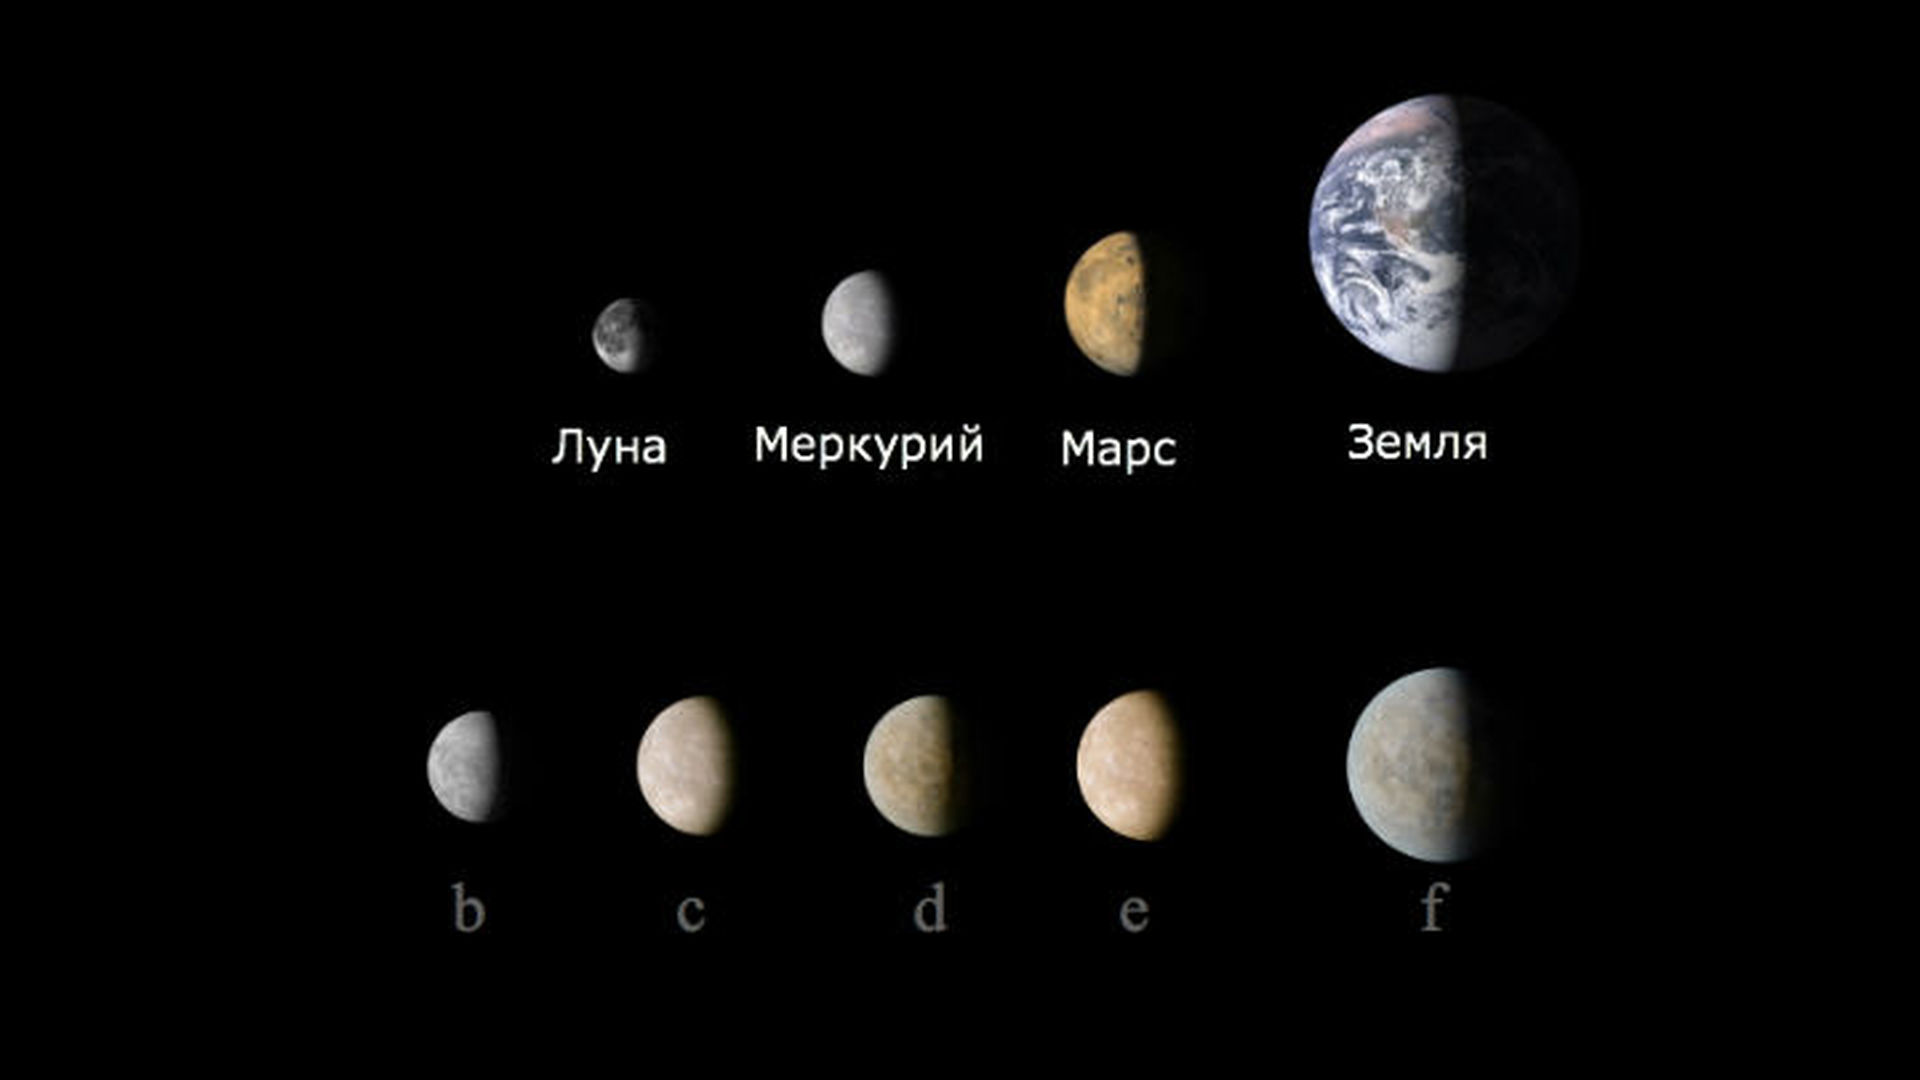 mars compared to mercury - 720×540